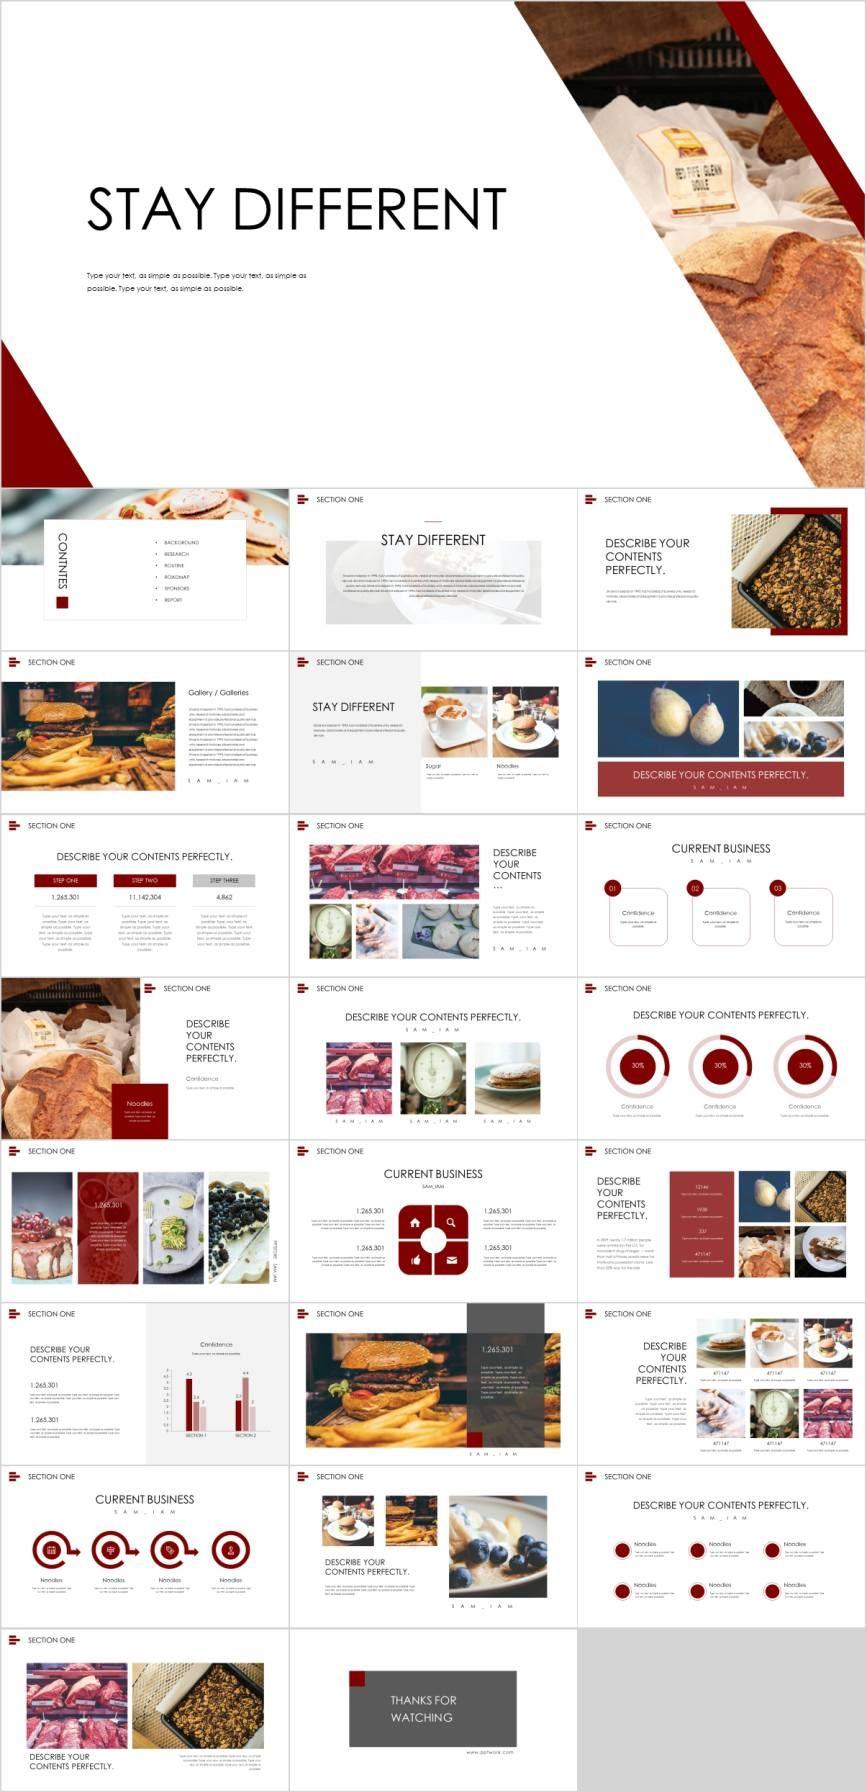 Creative foodindustry analysis PowerPoint template